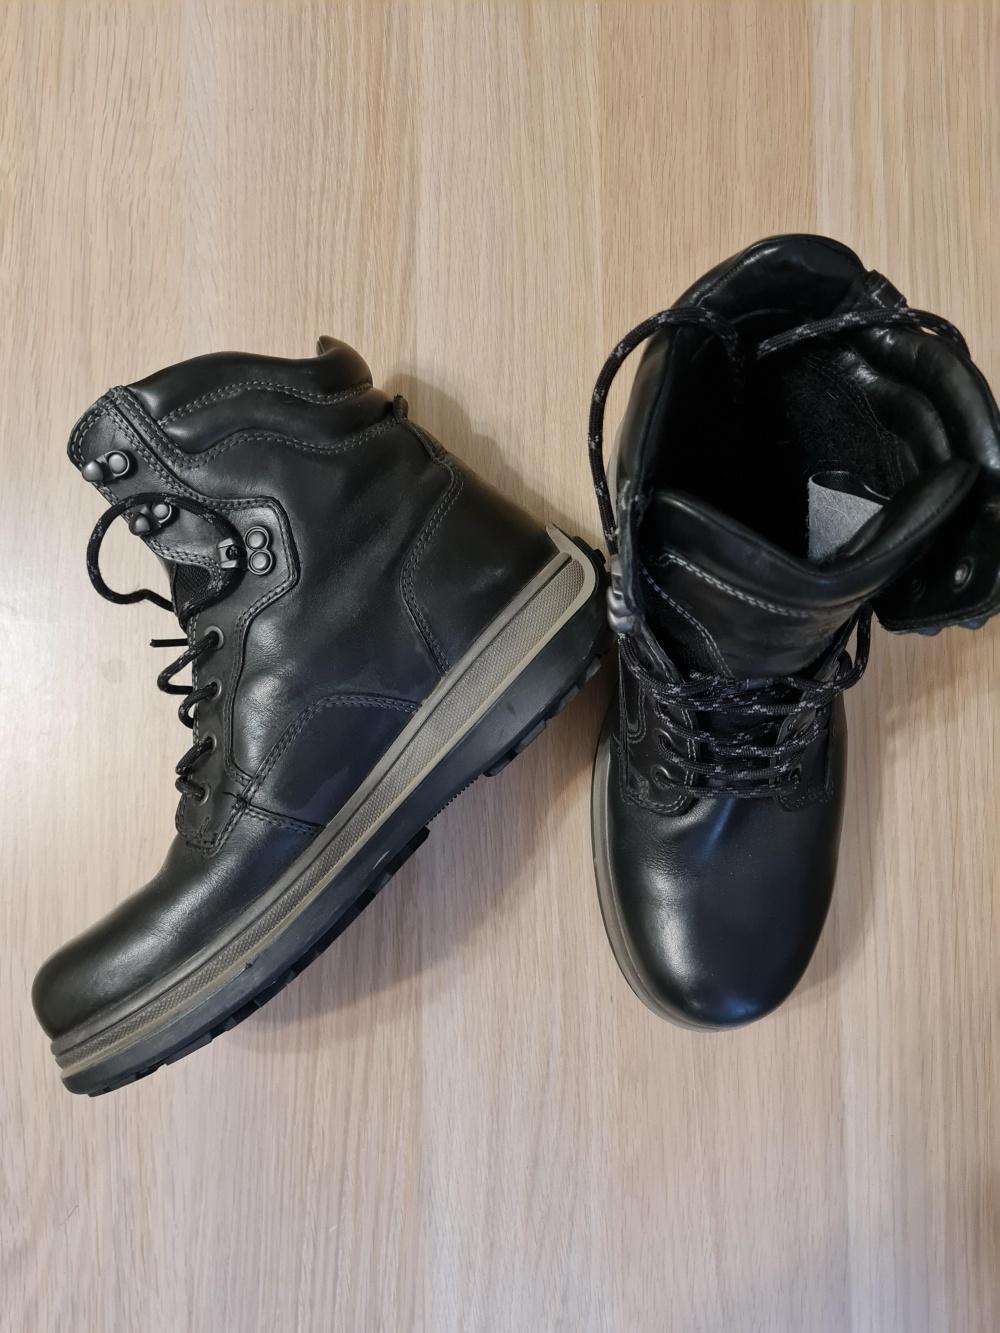 Ботинки зимние Ecco, размер 41